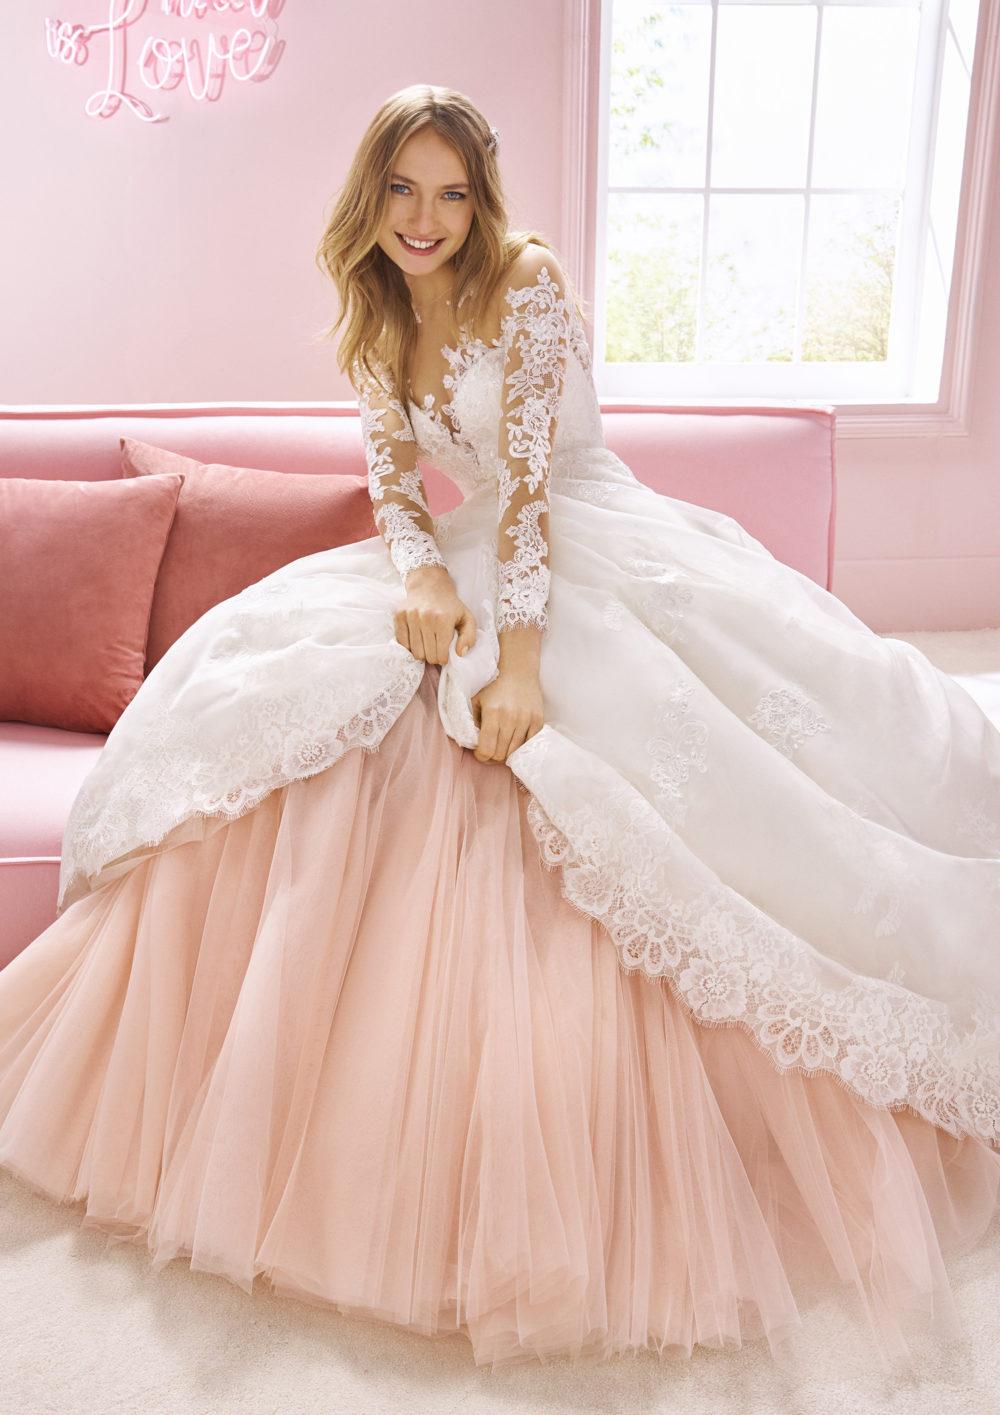 Mariages: abito da sposa Poème 2020 a Vicenza, Verona, Padova, Veneto RUKSHANA